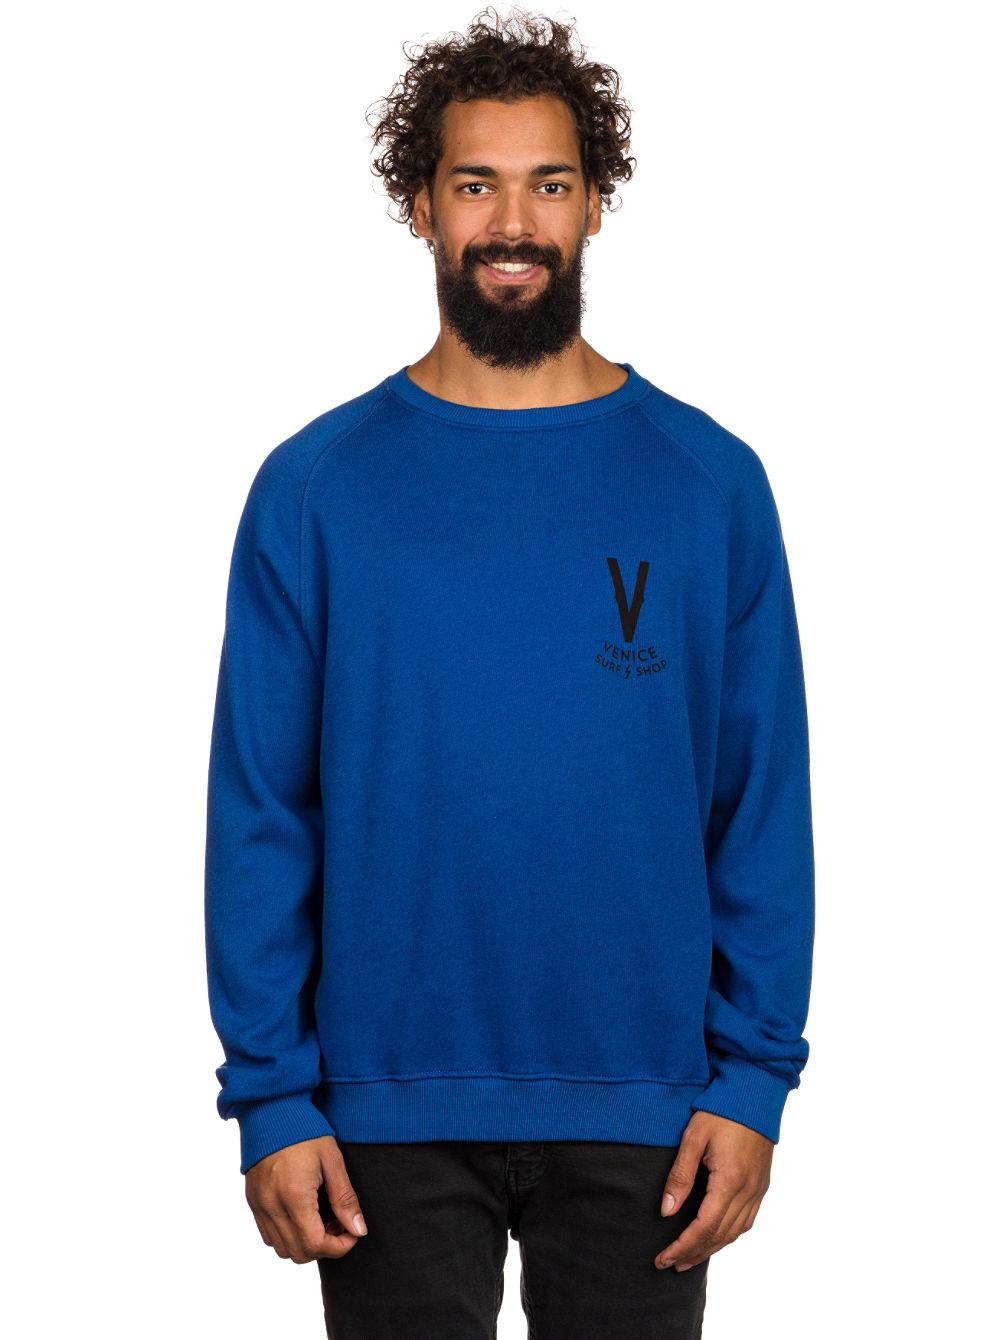 lightning-bolt-venice-surf-shop-tribeld-crew-sweater